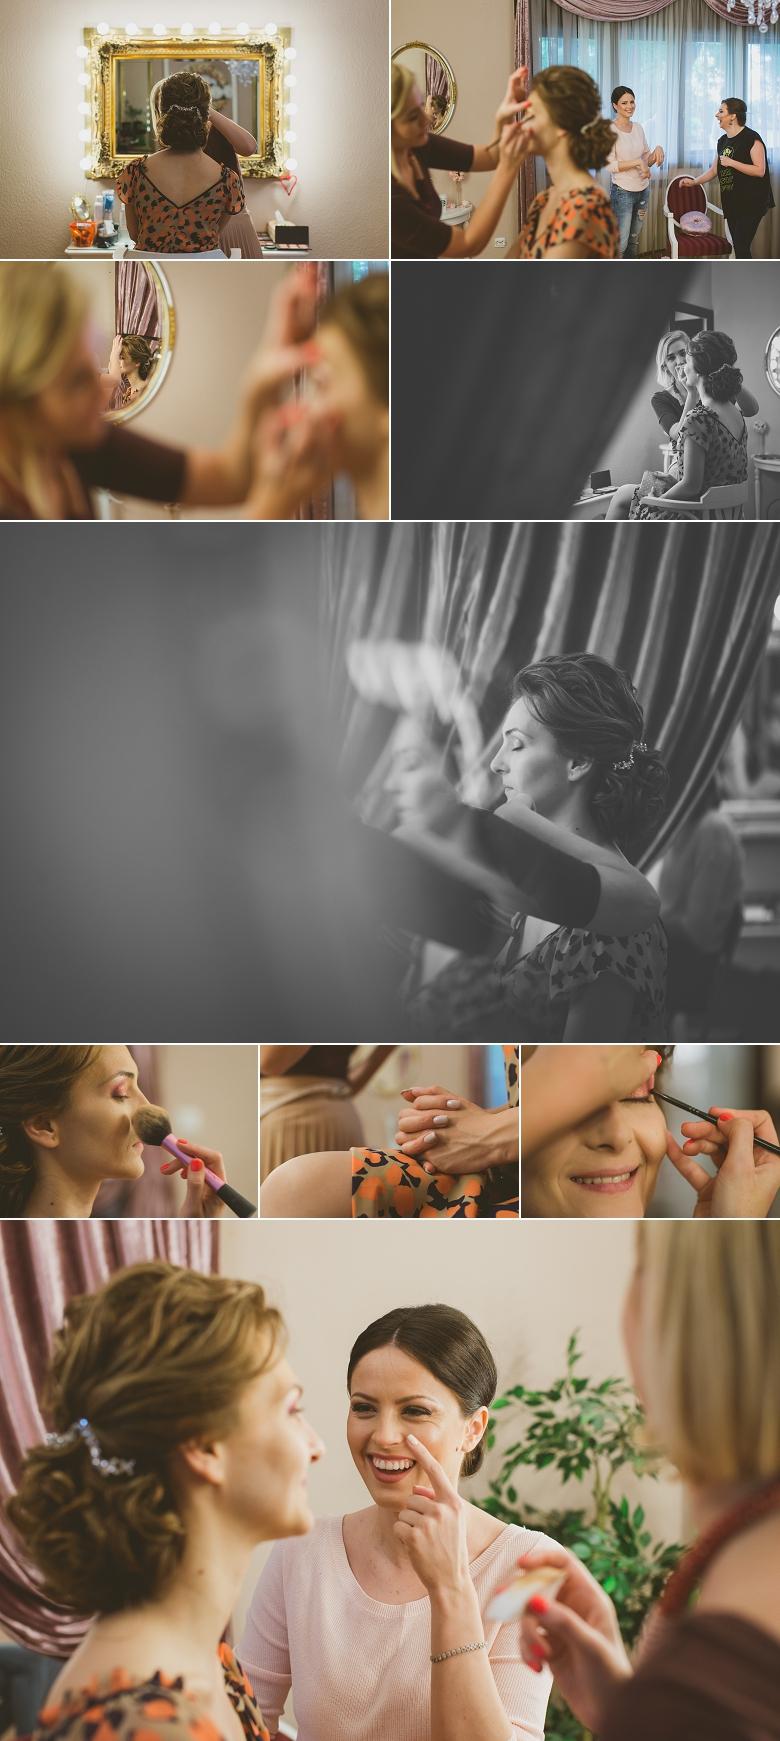 foto_video_nunta_cluj_fotograf_profesionist_nunta_cluj_dej_bistrita_nasaud_ 4